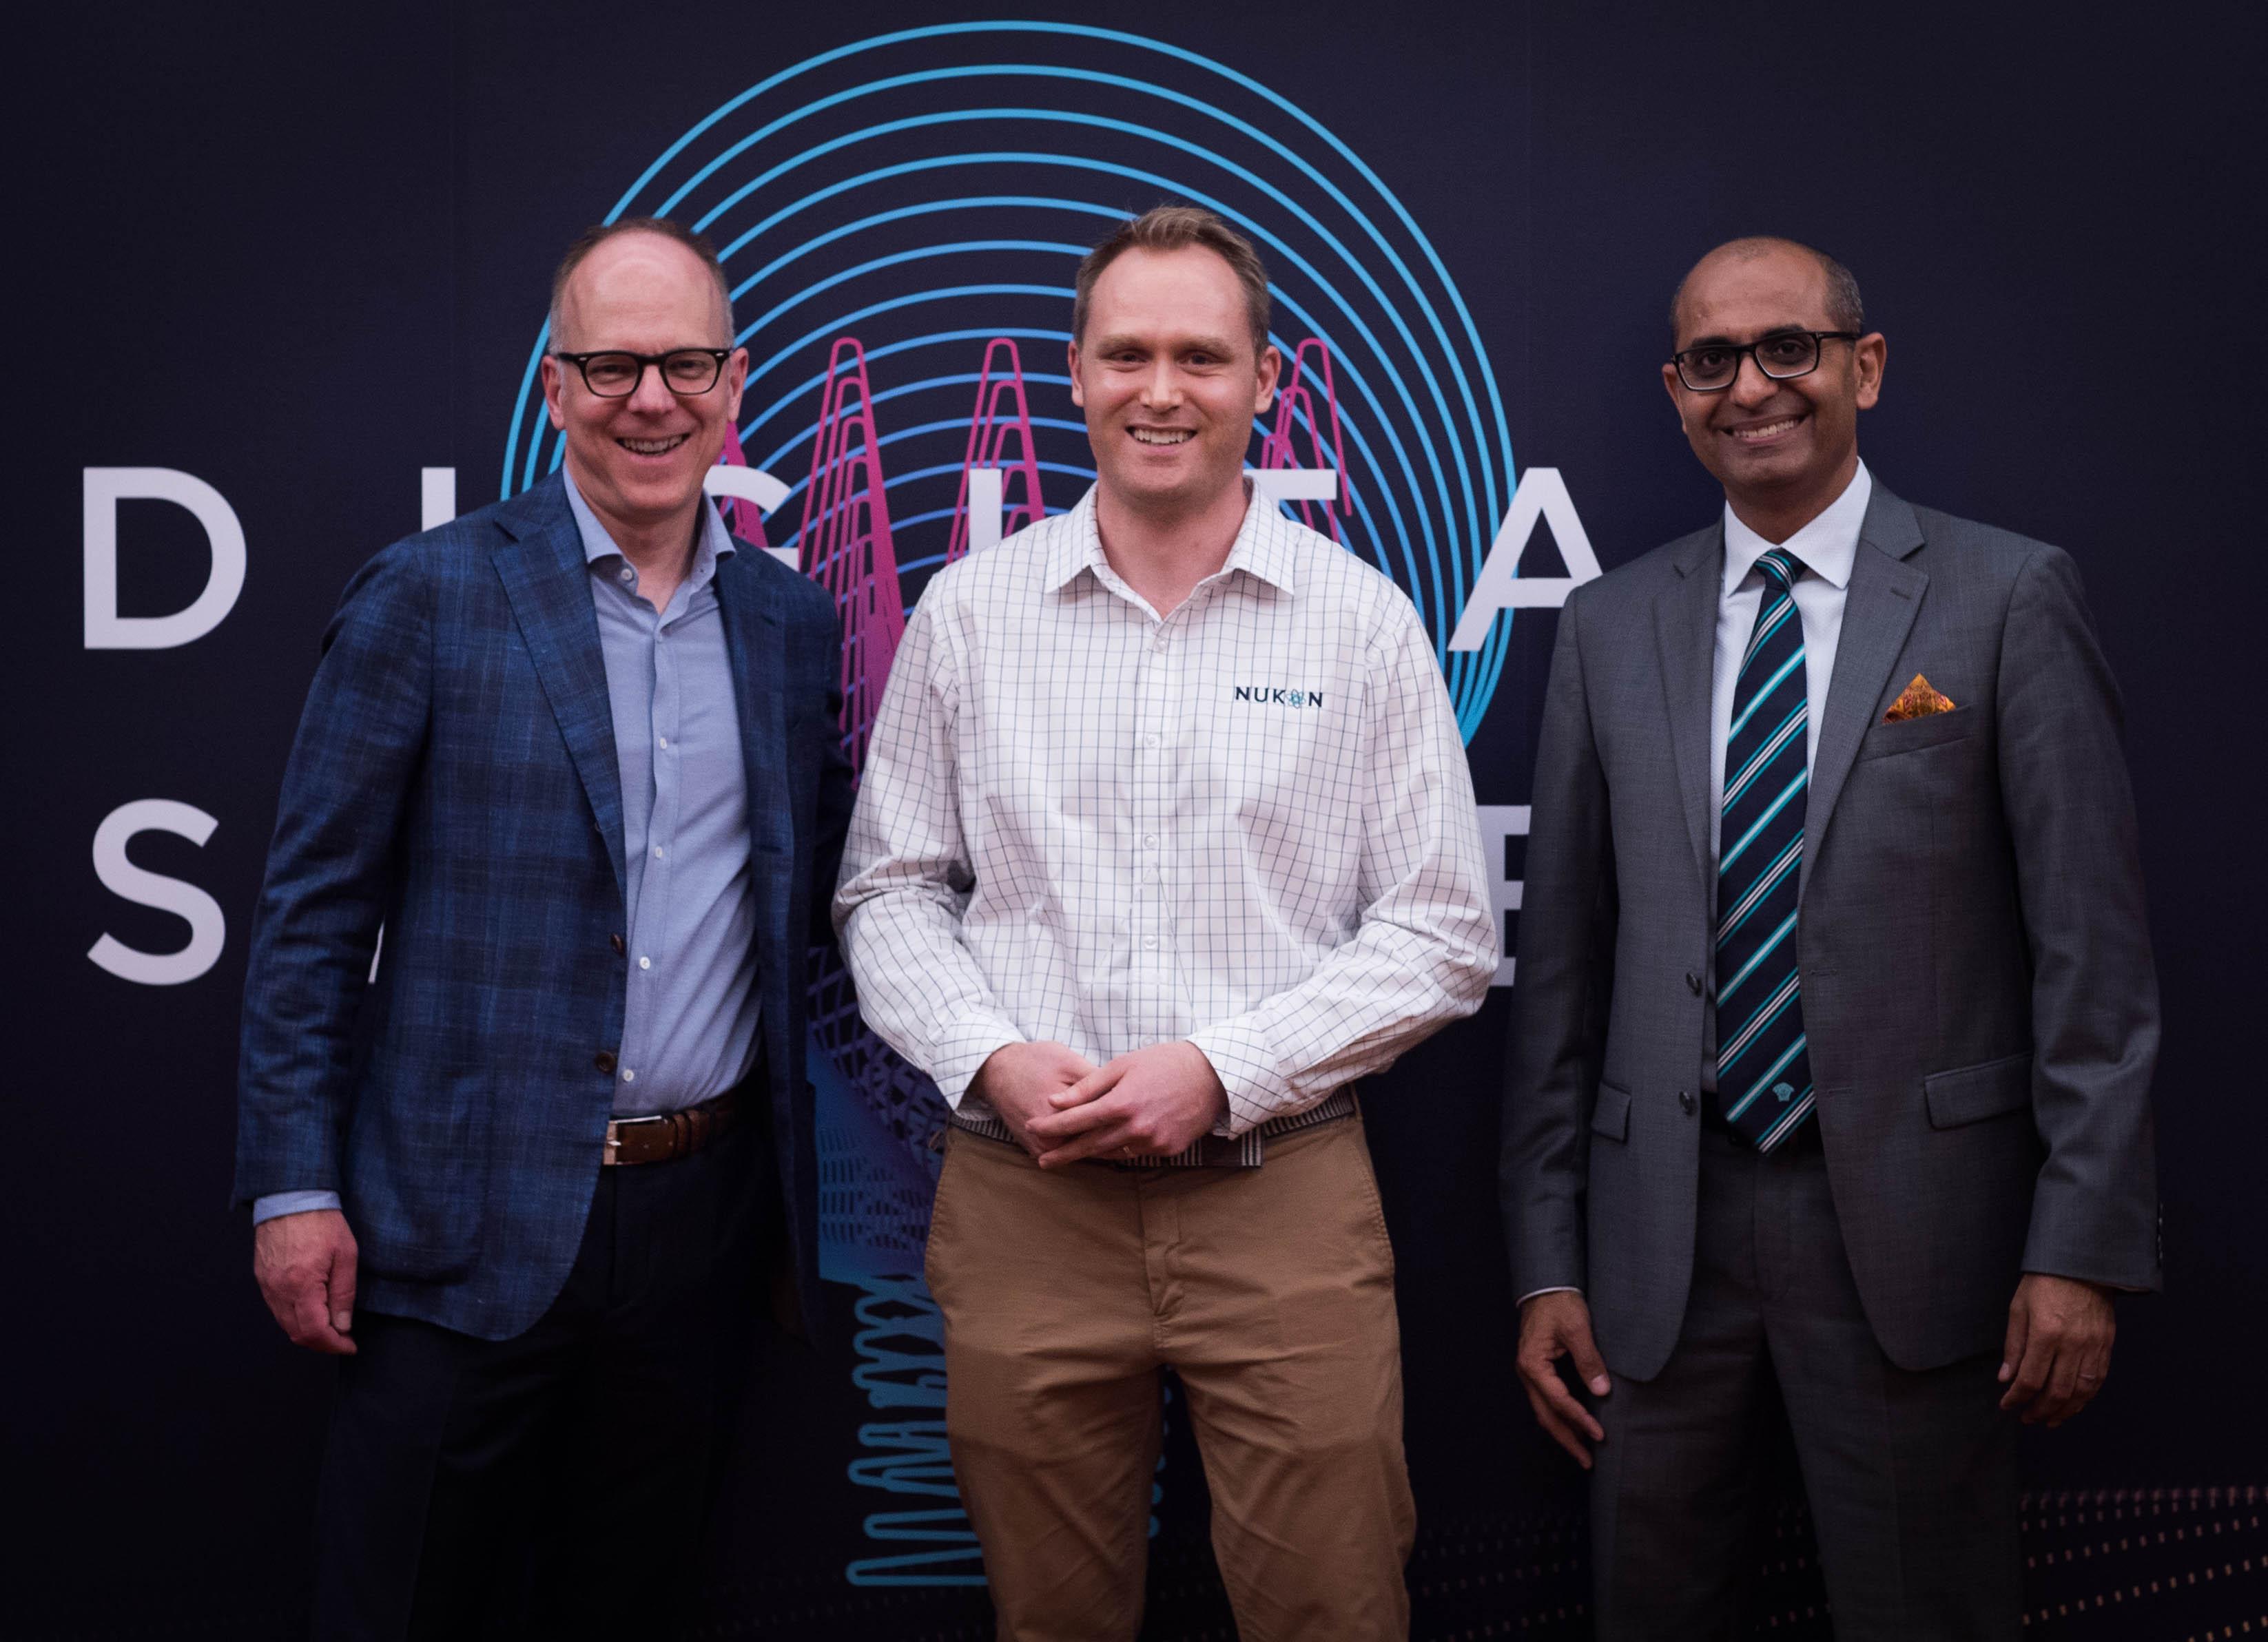 TIBCO Now Partner awards Nukon 1